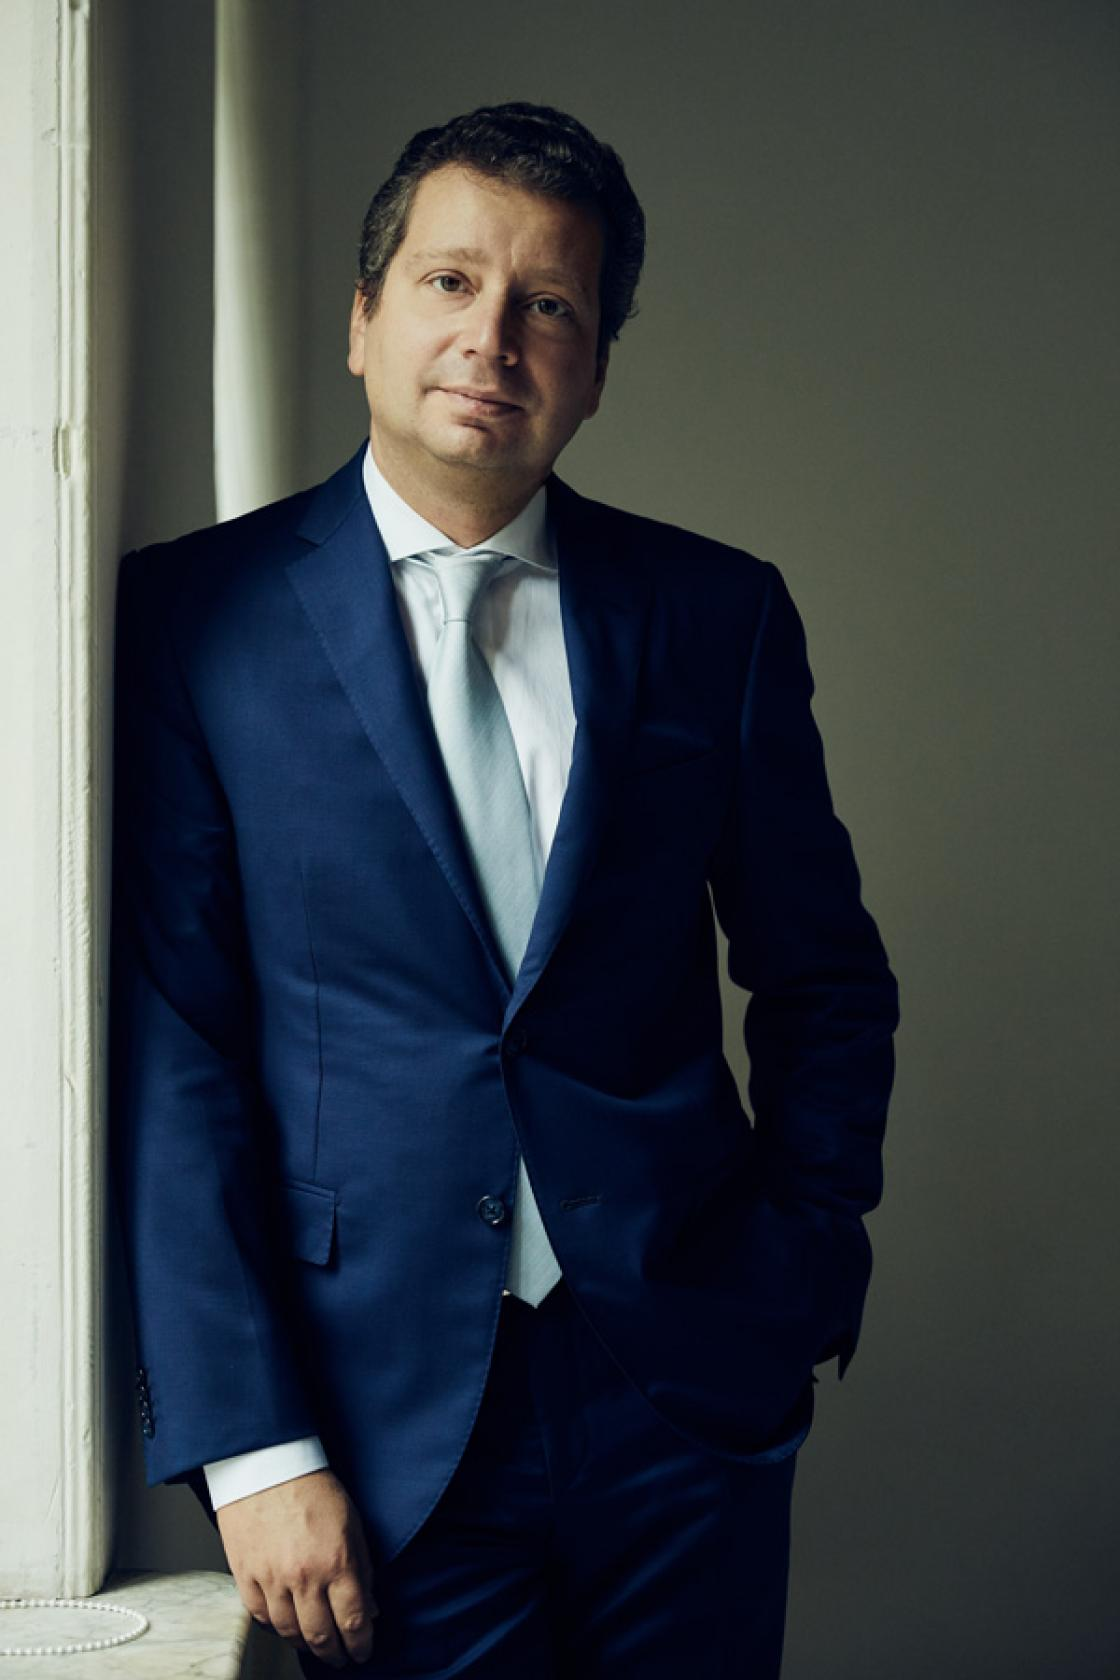 Photograph of Dmitri Makhtin